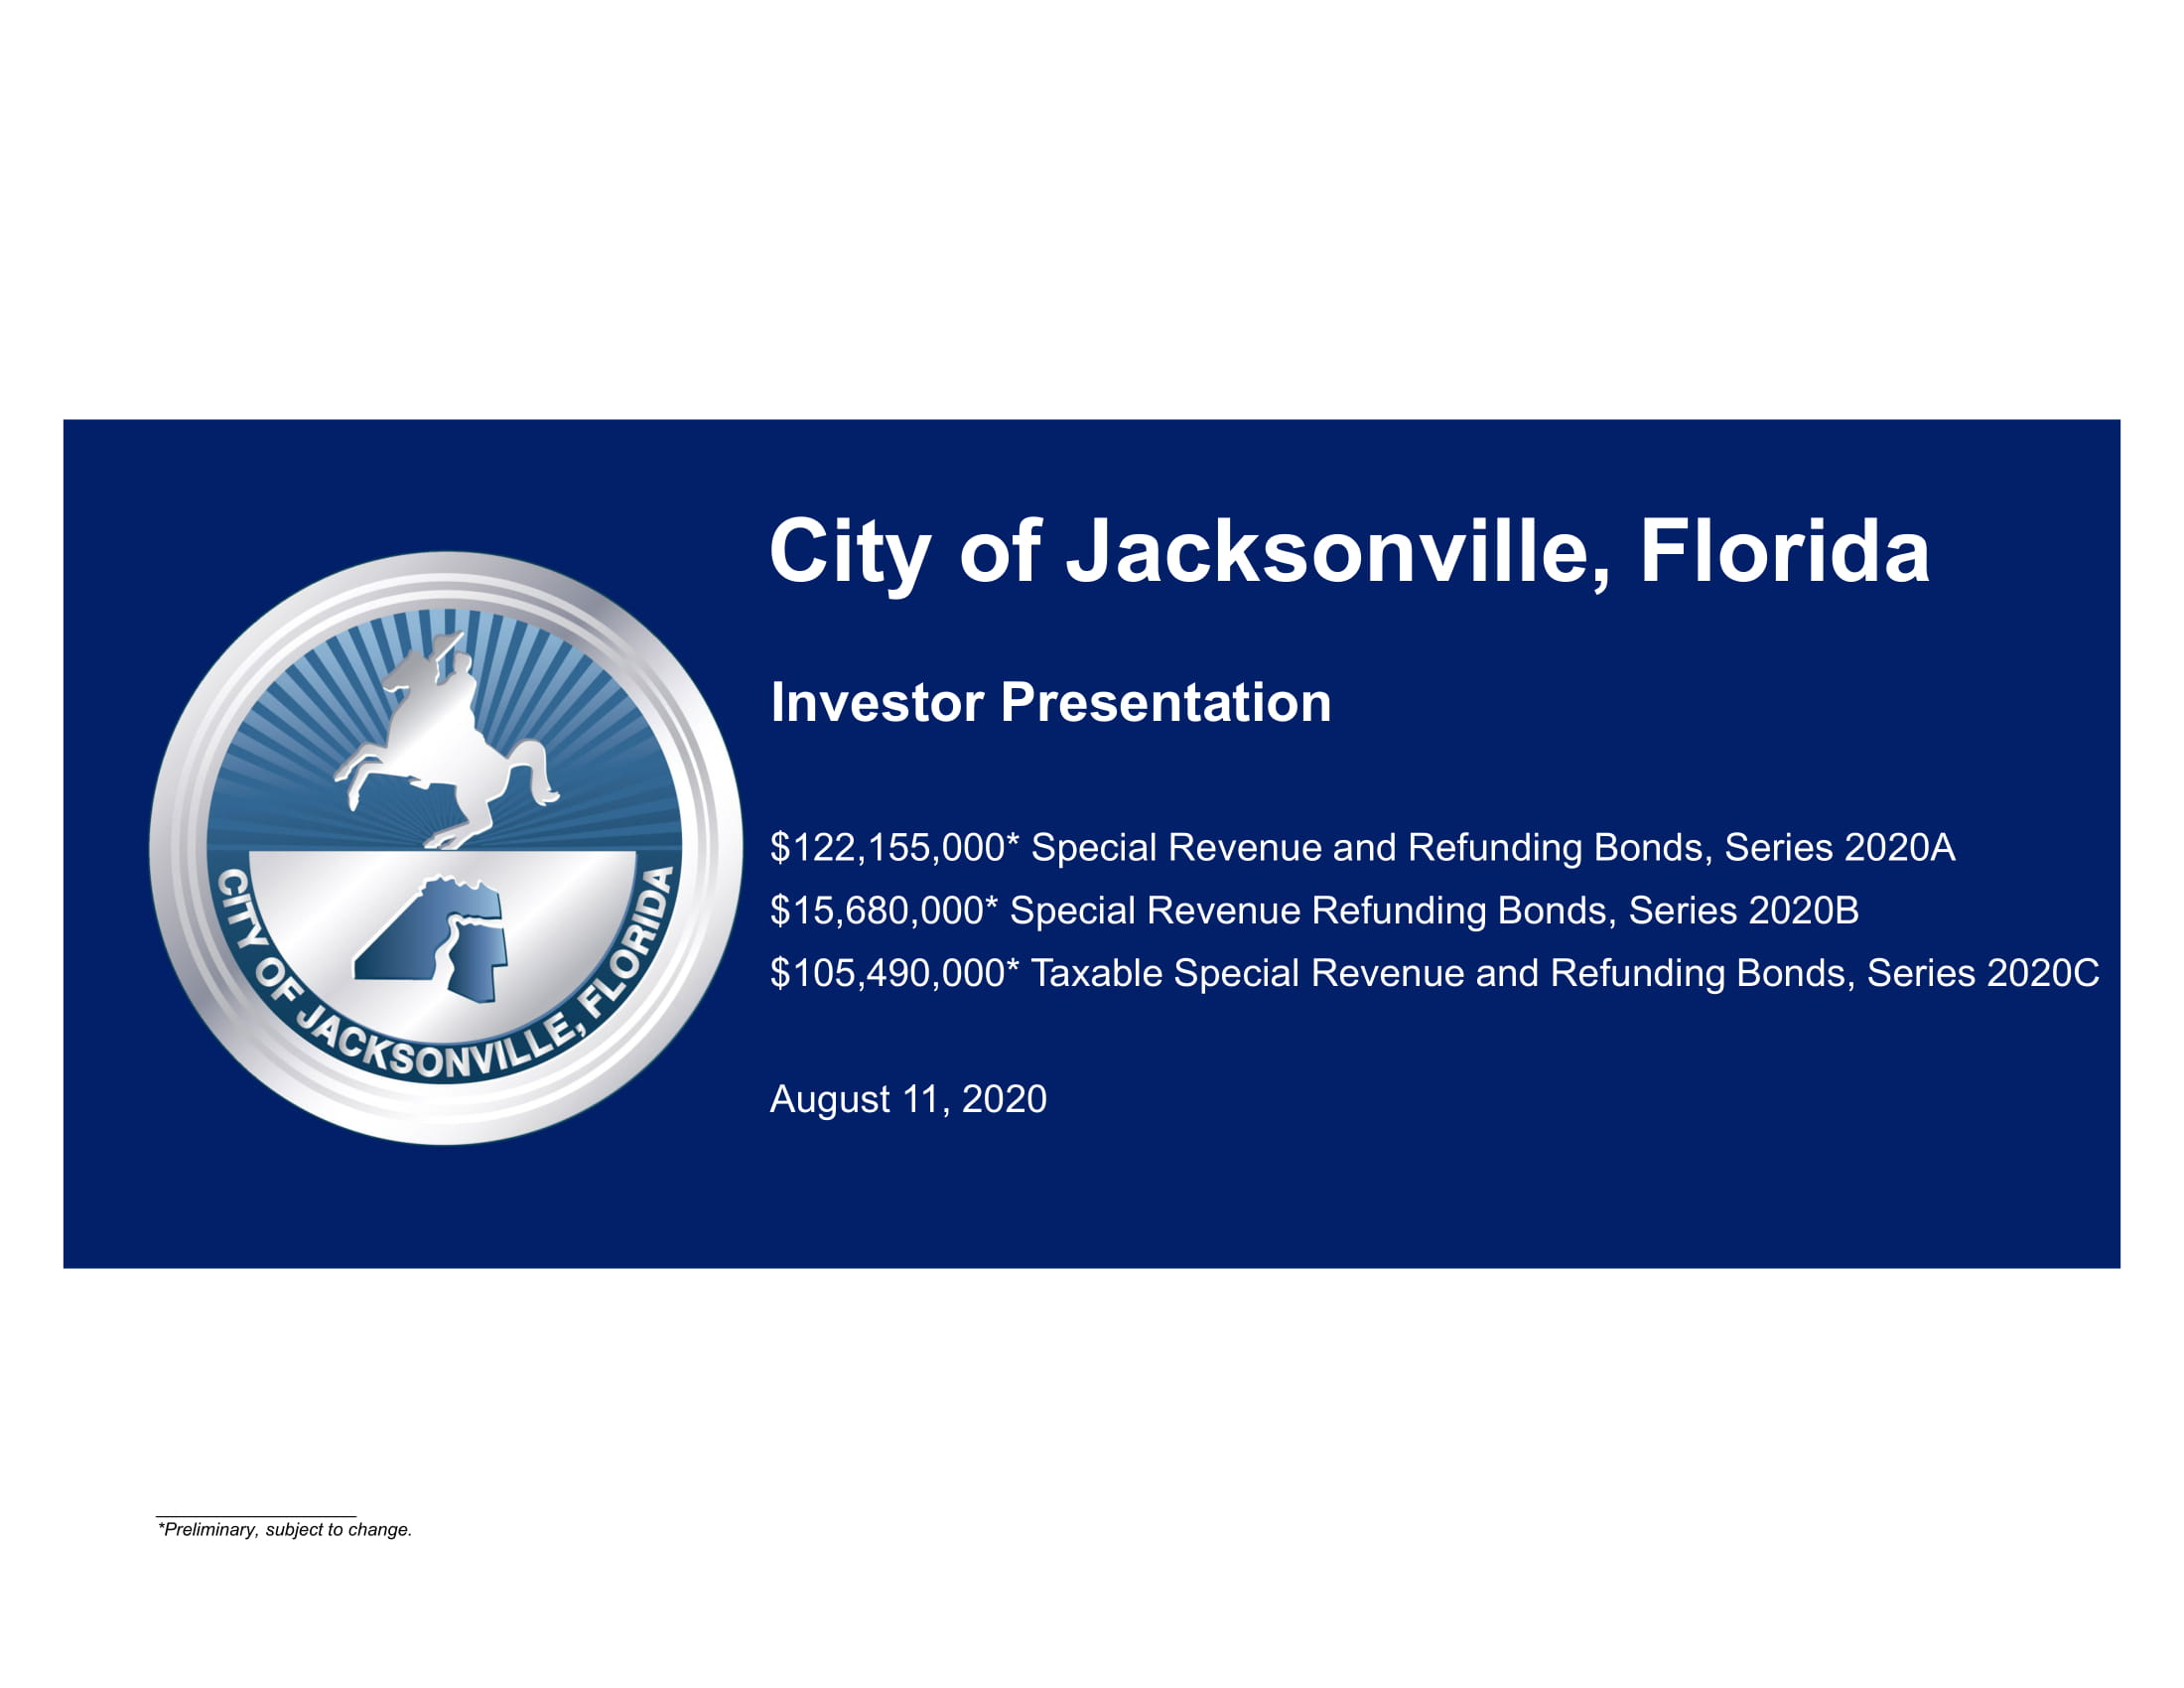 City of Jacksonville, Florida Investor Presentation